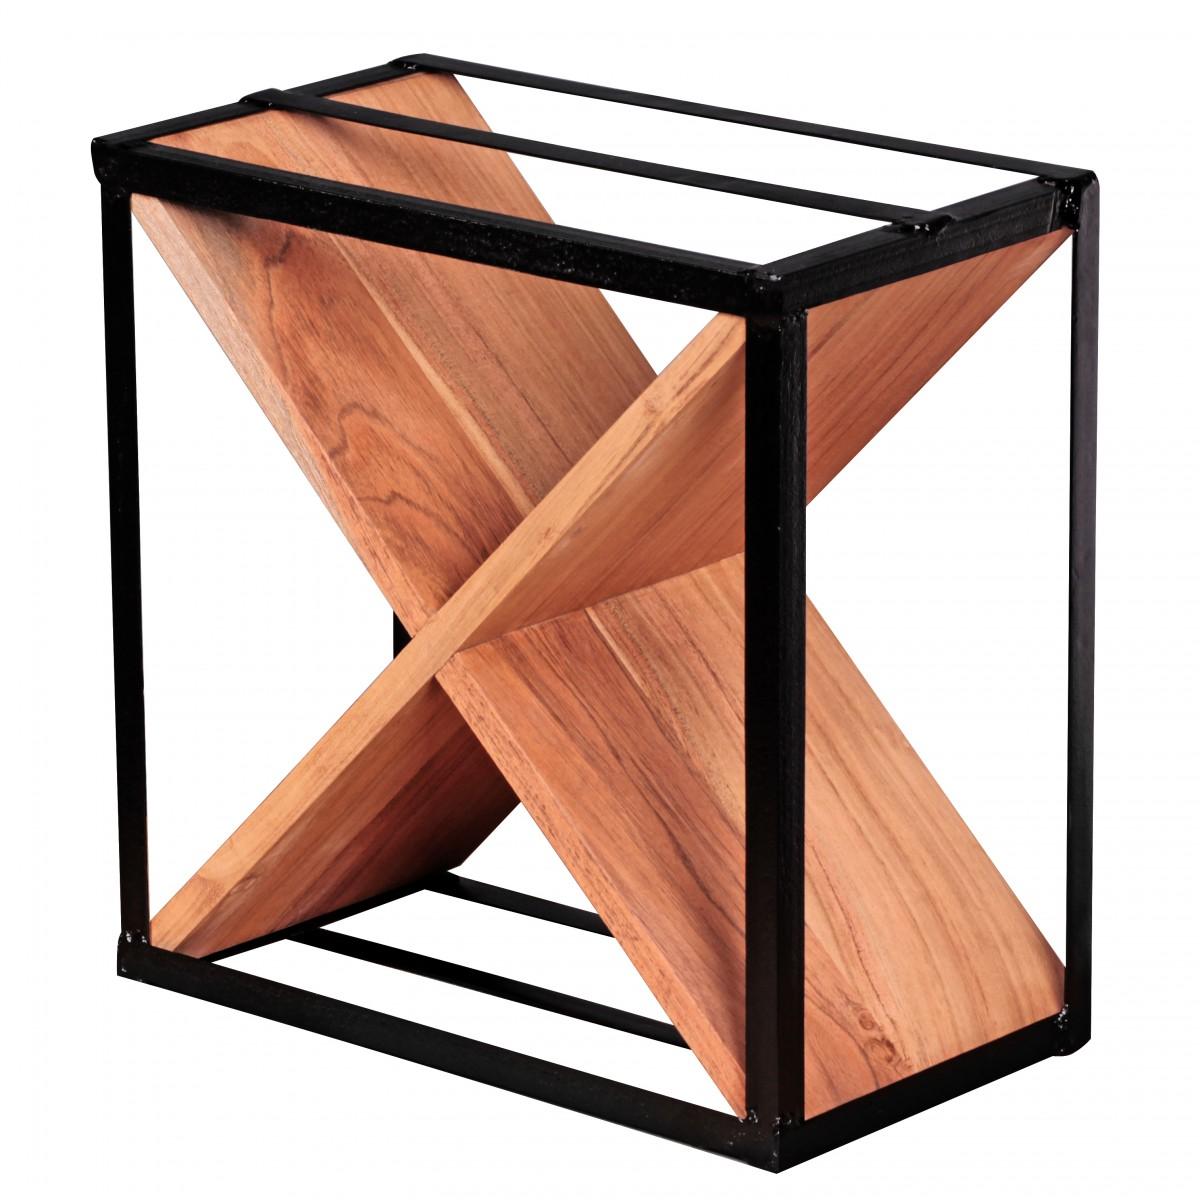 wohnling weinregal massiv holz akazie flaschenregal f r 16. Black Bedroom Furniture Sets. Home Design Ideas